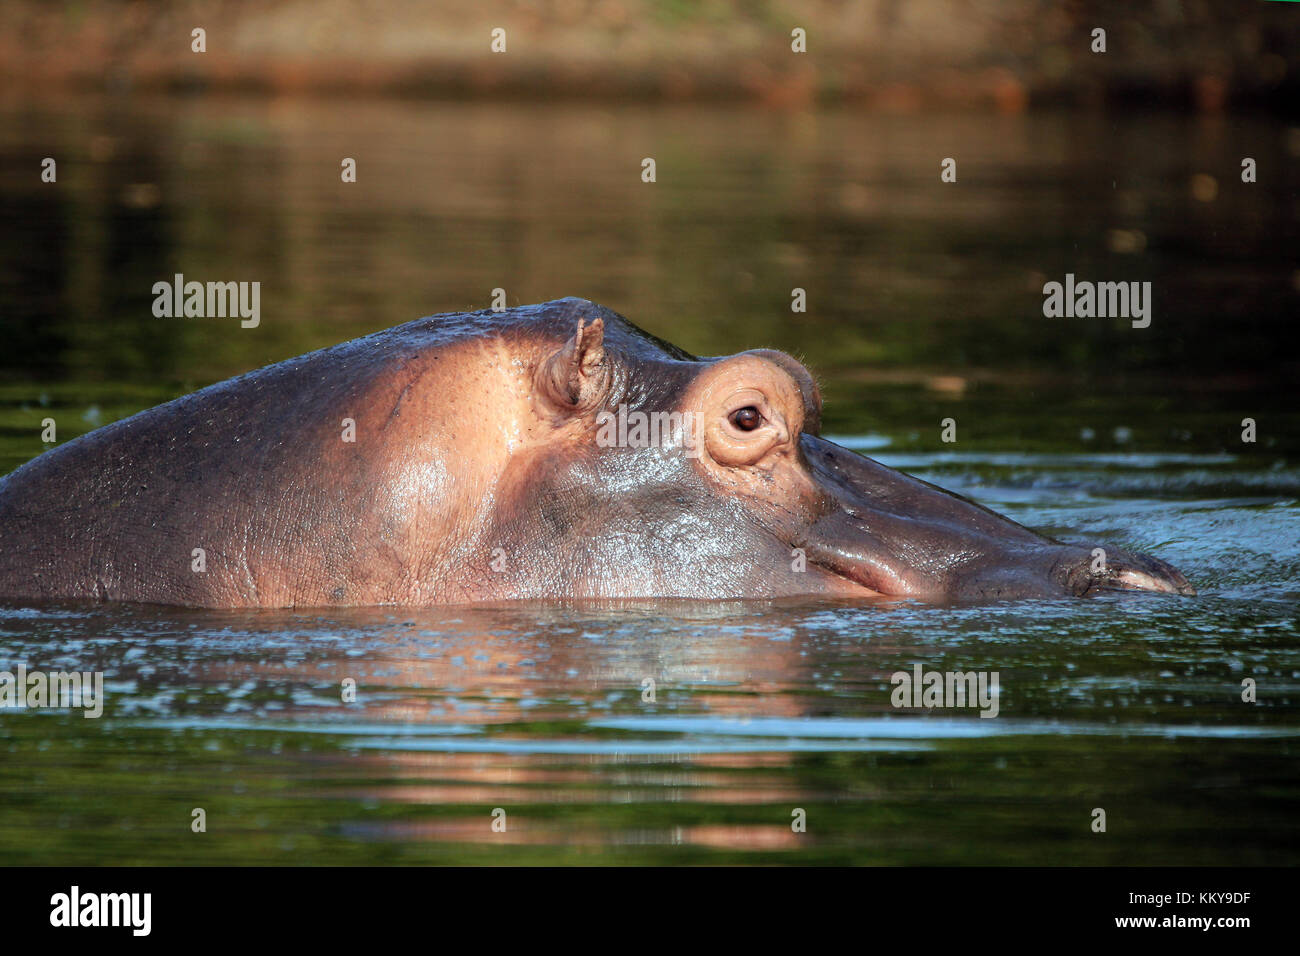 Hippopotamus (Hippopotamus Amphibius) in the Water, looking over the Surface. Lake Mburo, Uganda - Stock Image